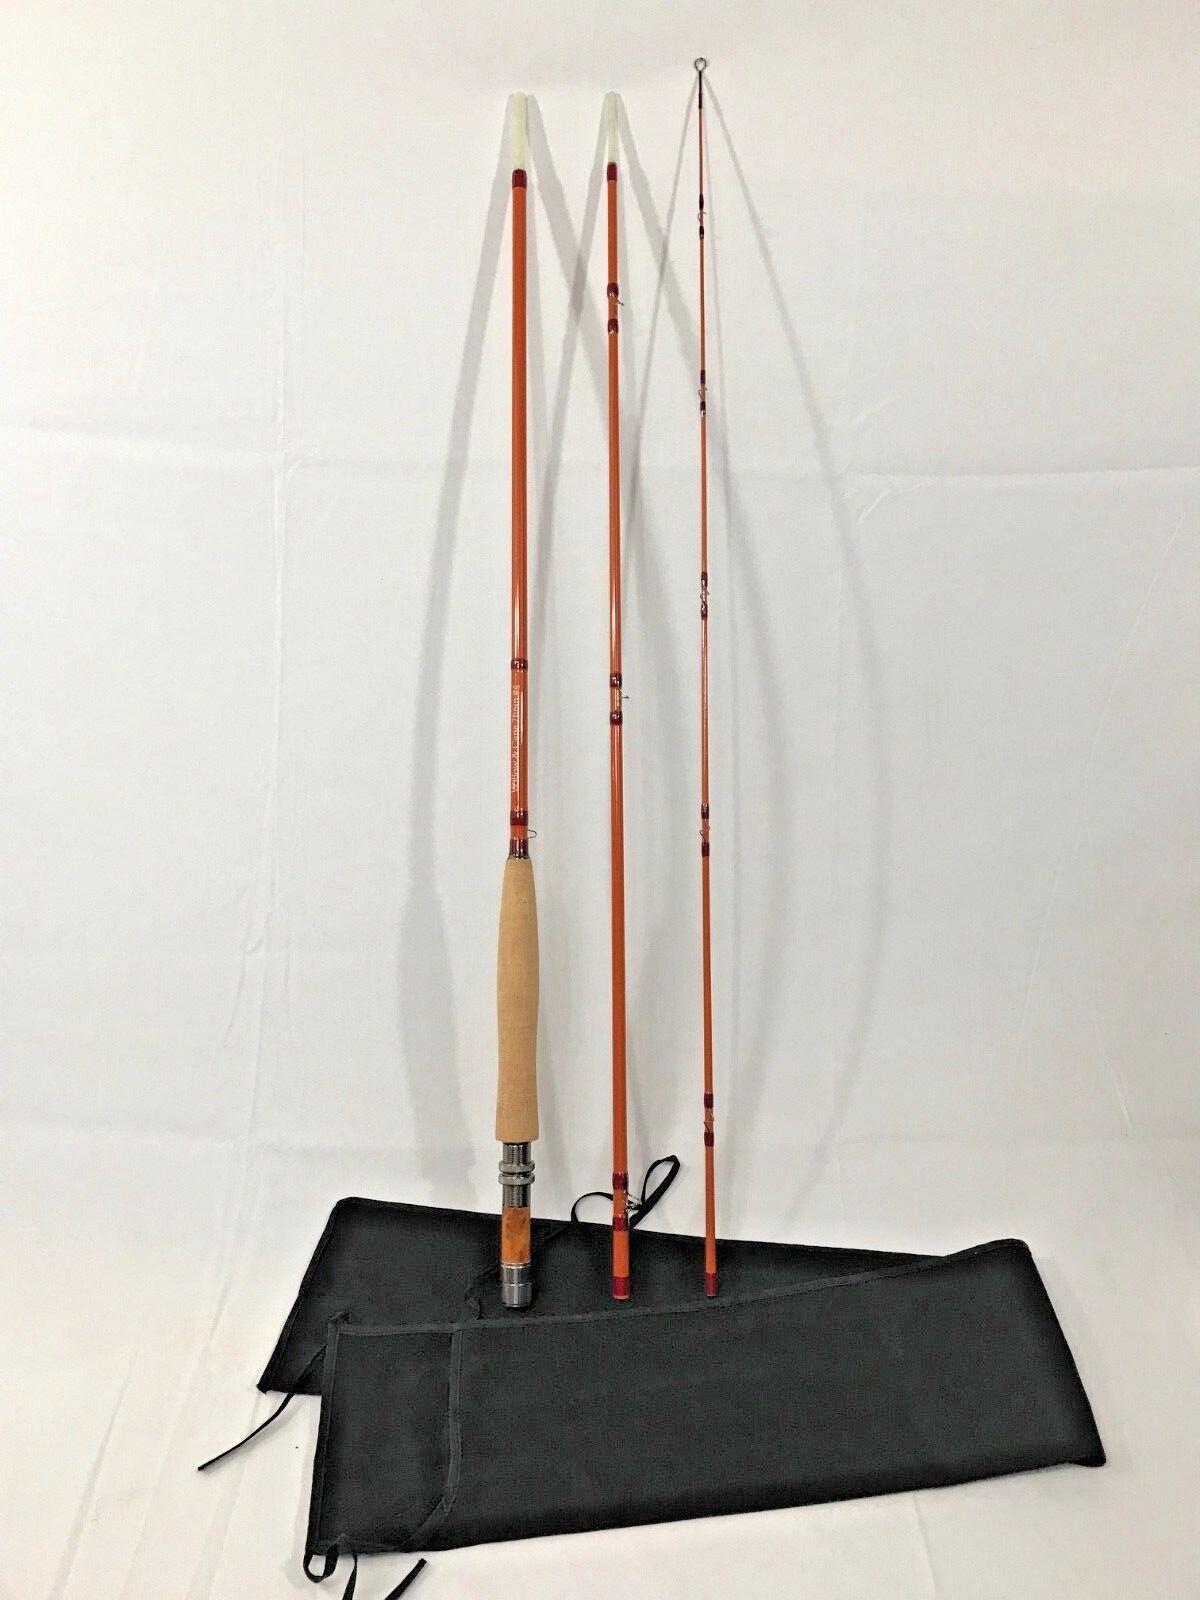 Pesca con Mosca Nº 3 WT Vidrio-Nuevo-naranja Usa